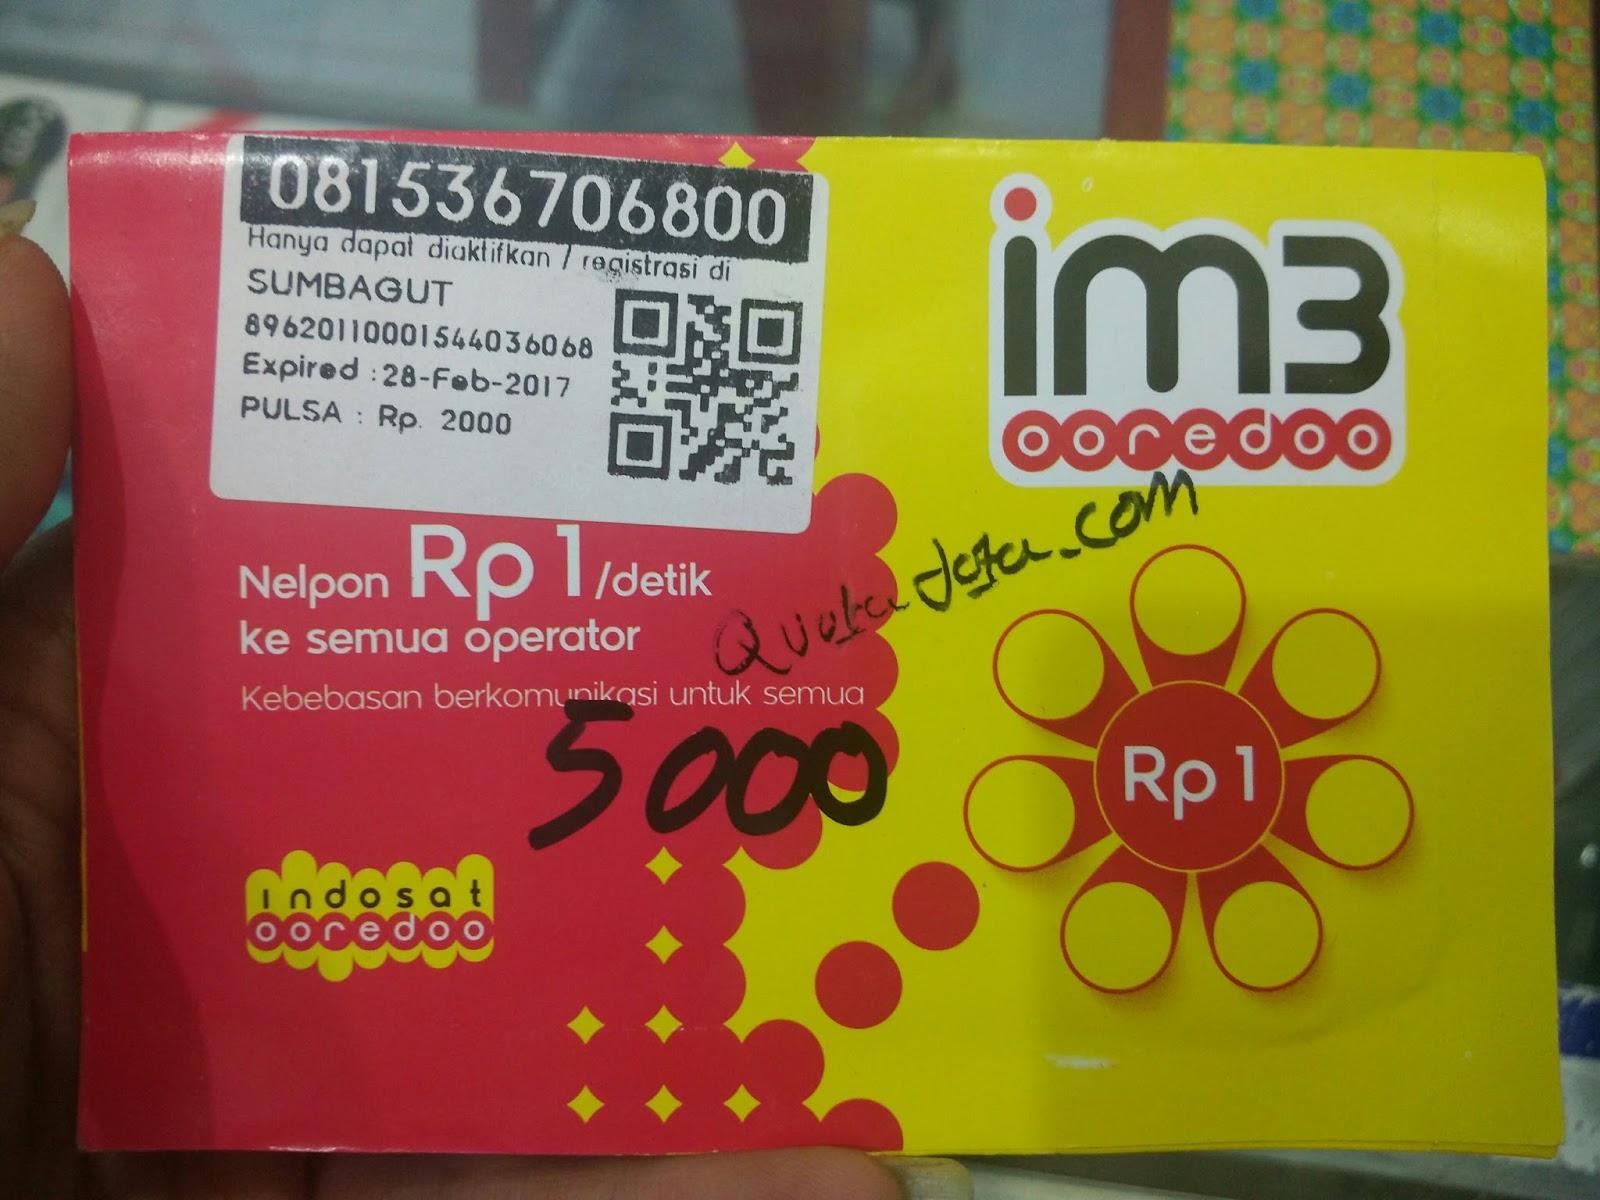 Cara Mendapatkan Kuota Gratis 20GB IM3 Indosat Ooredoo